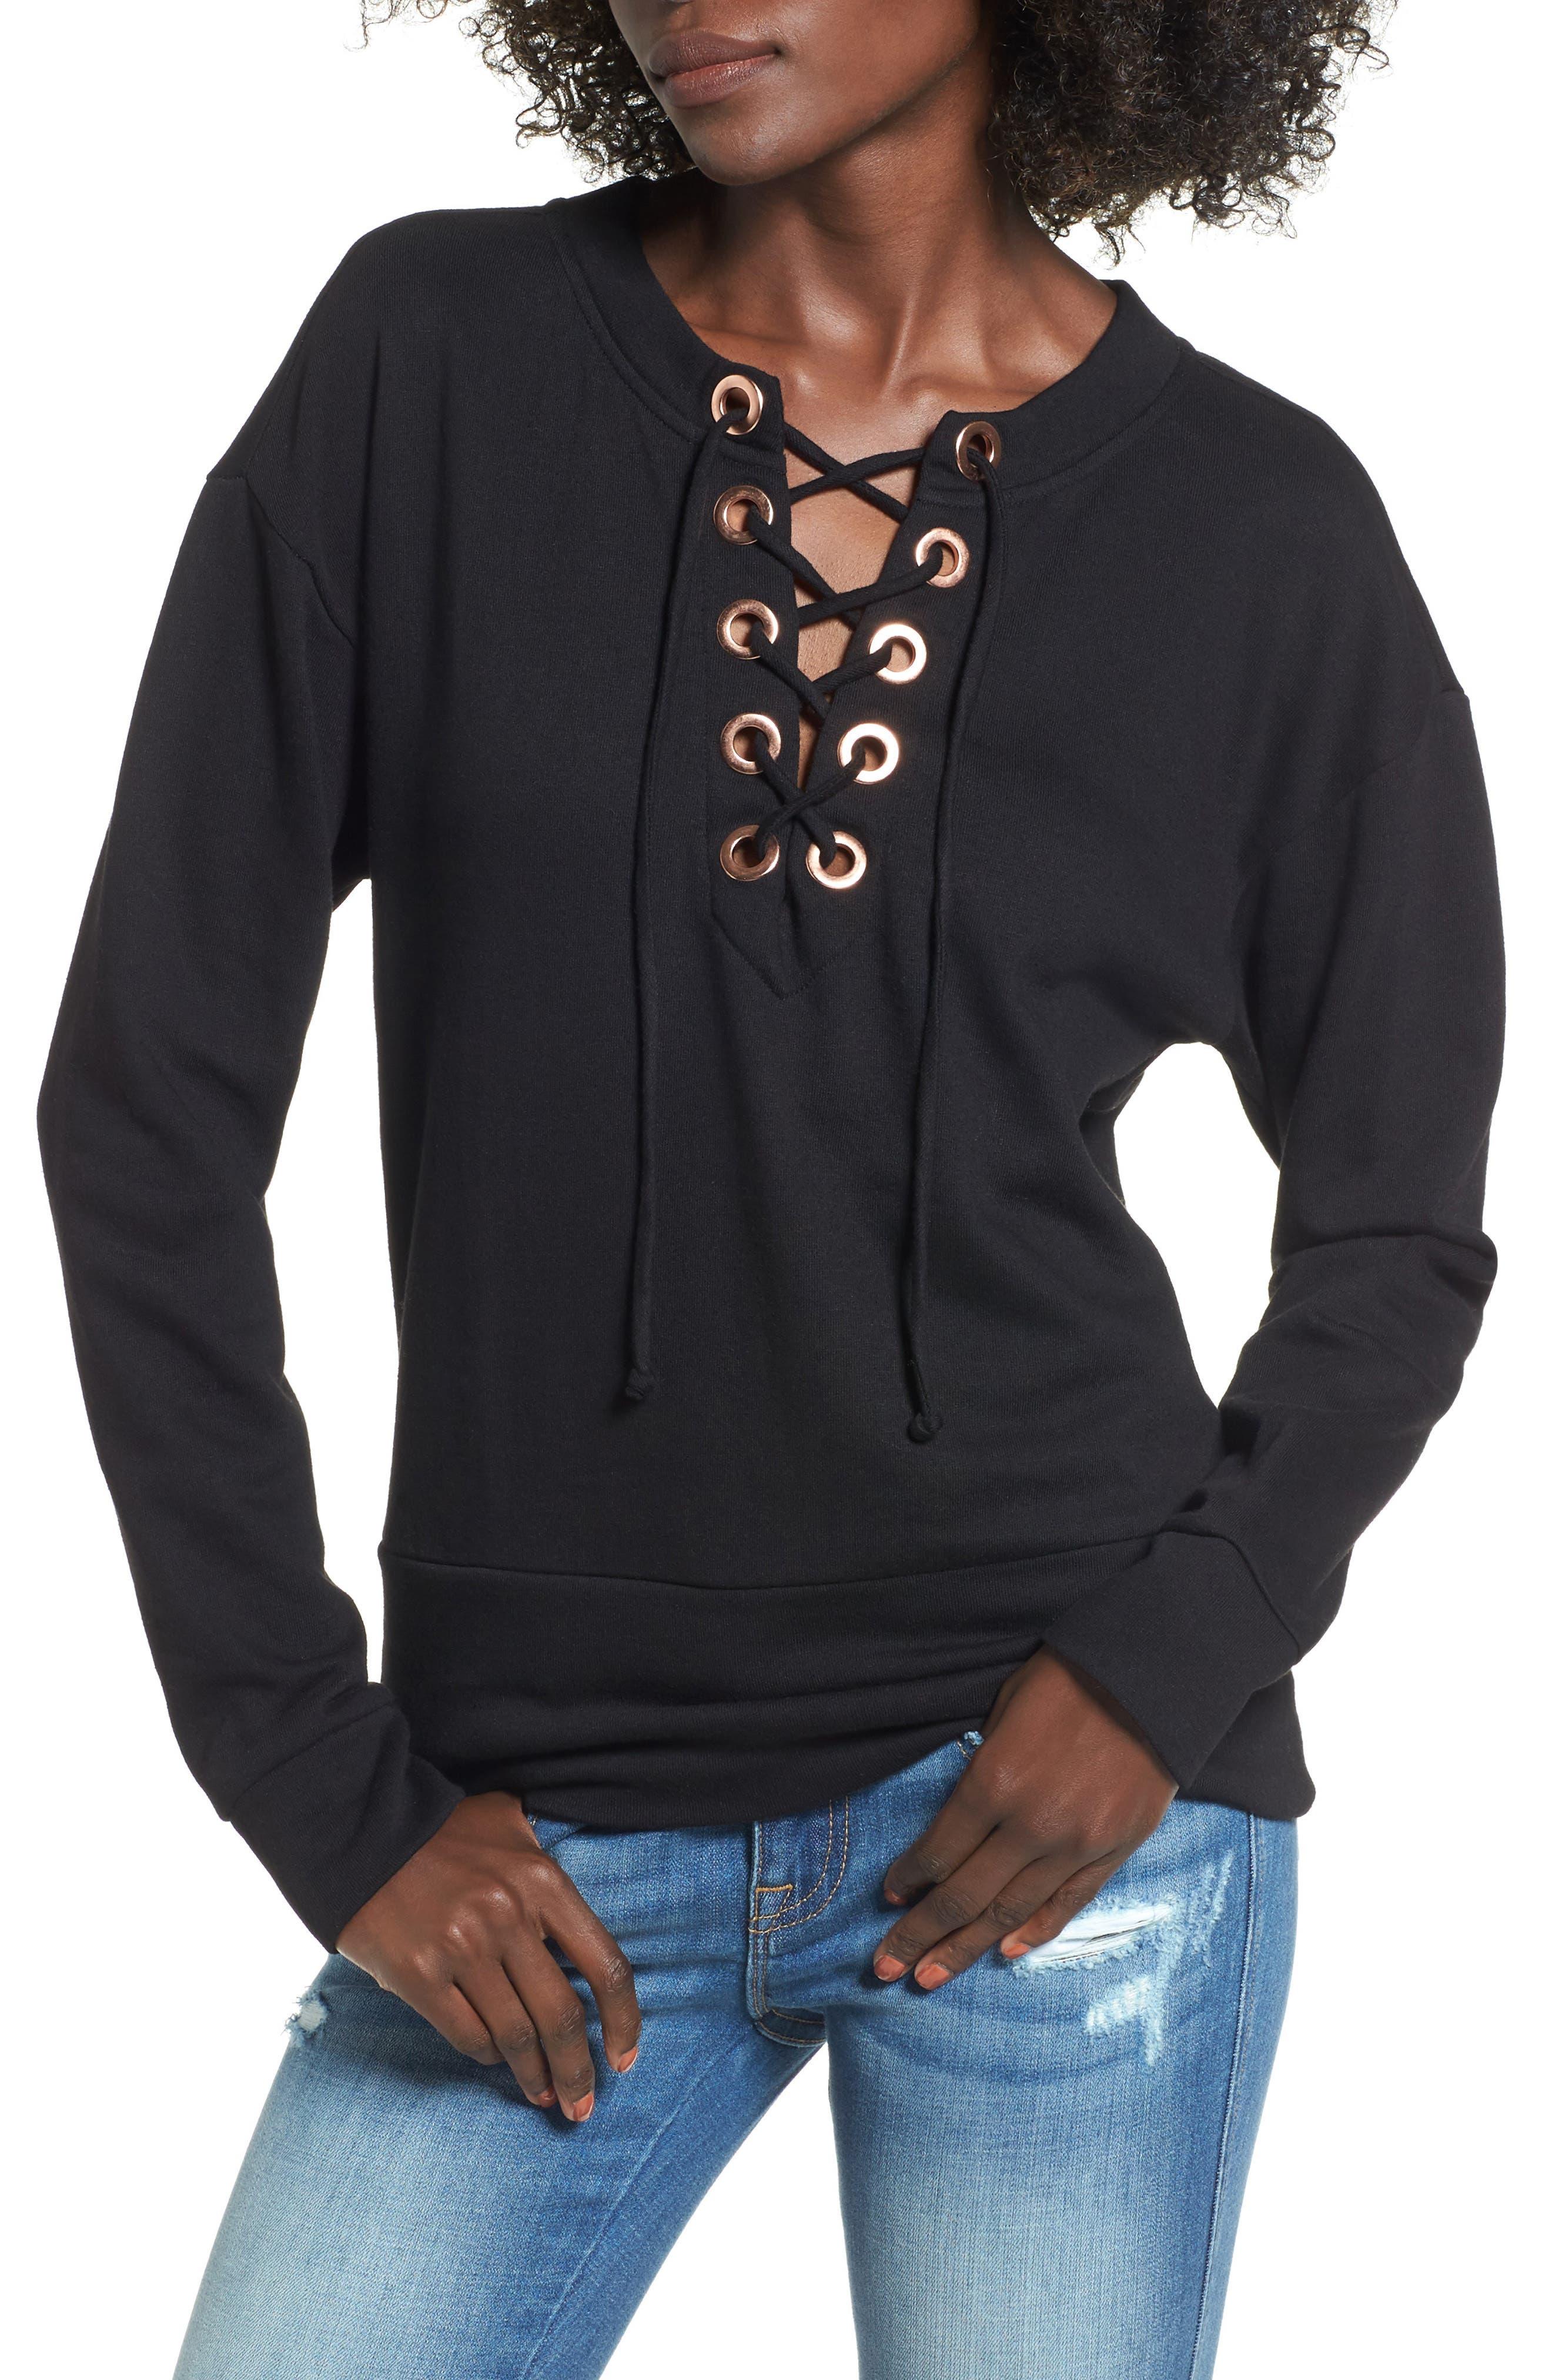 Main Image - Socialite Lace-Up Sweatshirt